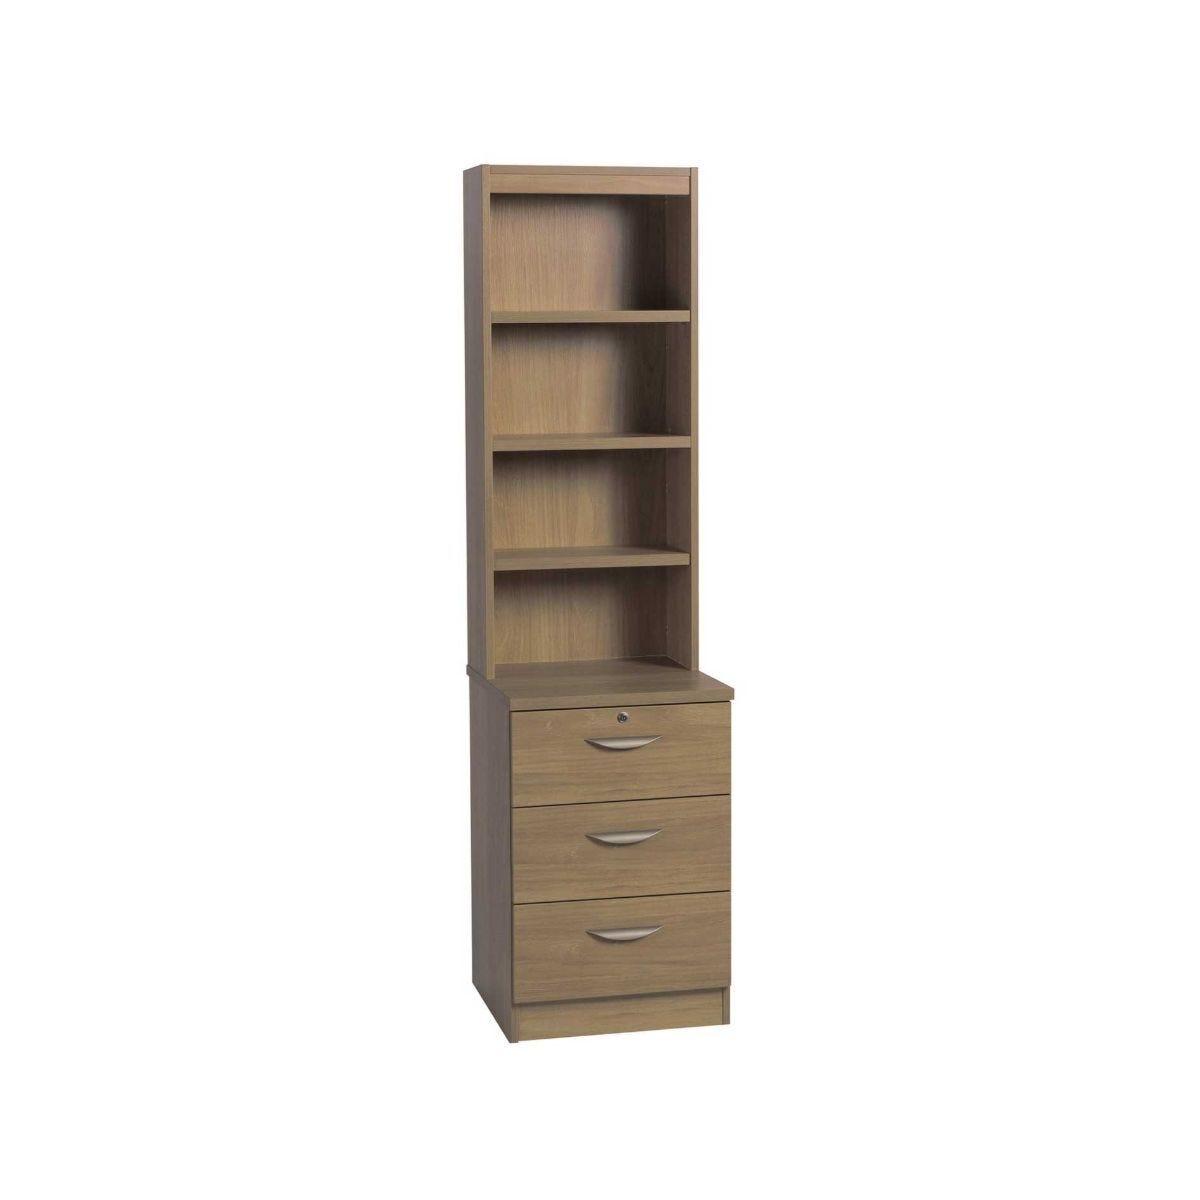 R White 3 Drawer CD/DVD Storage Unit With Overshelving English Oak Wood Grain